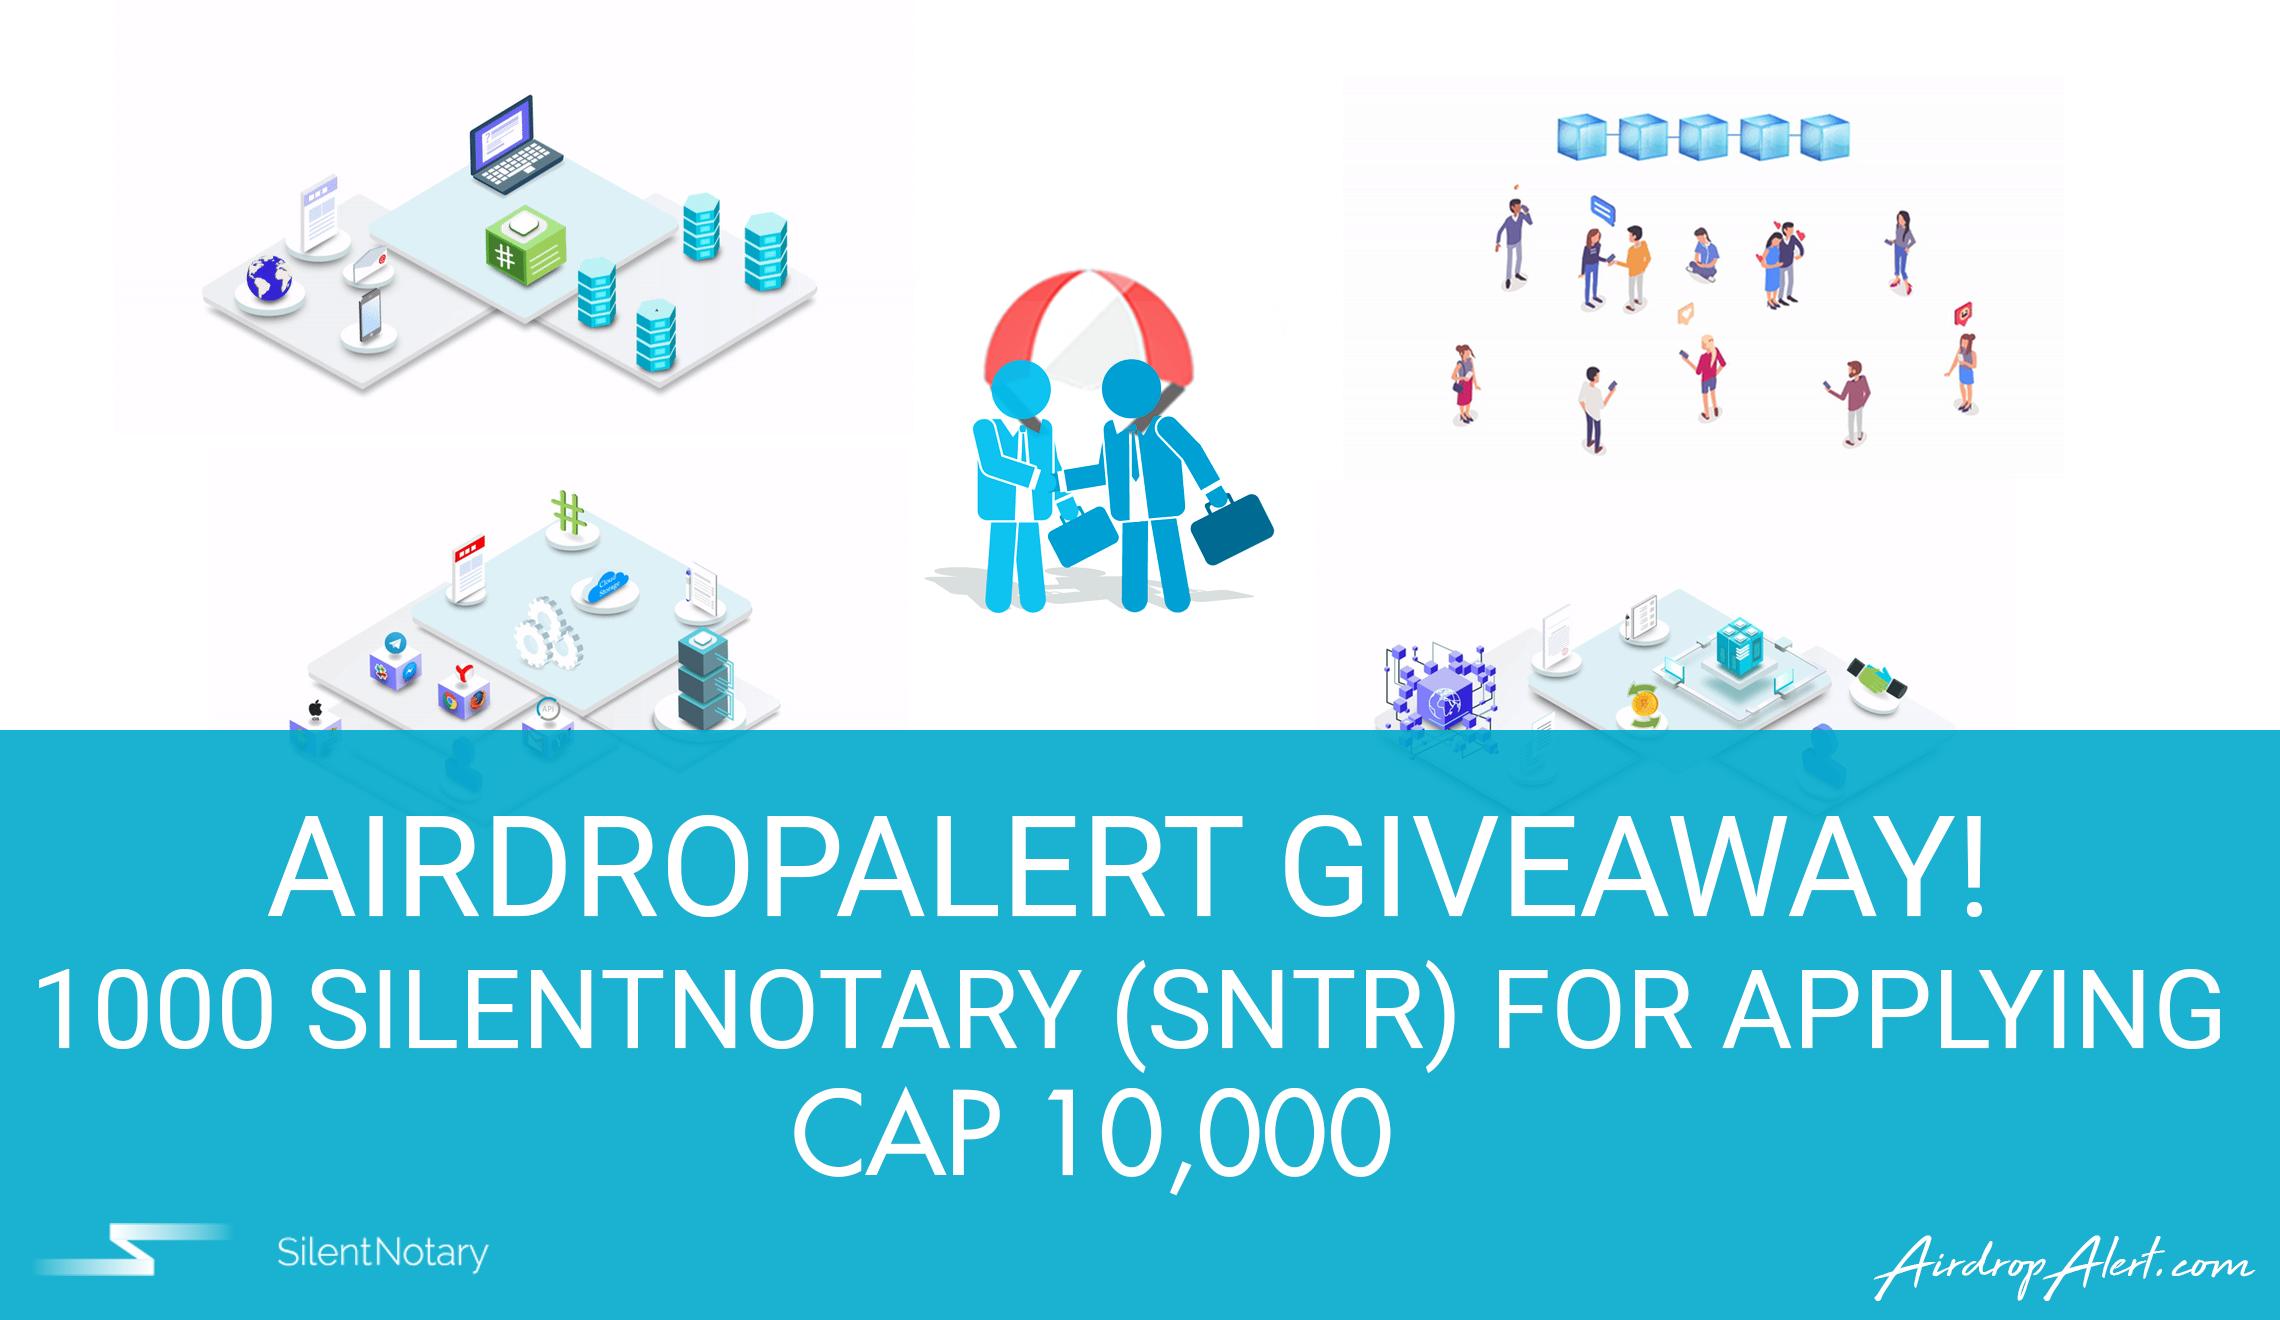 FAQ AirdropAlert Giveaway